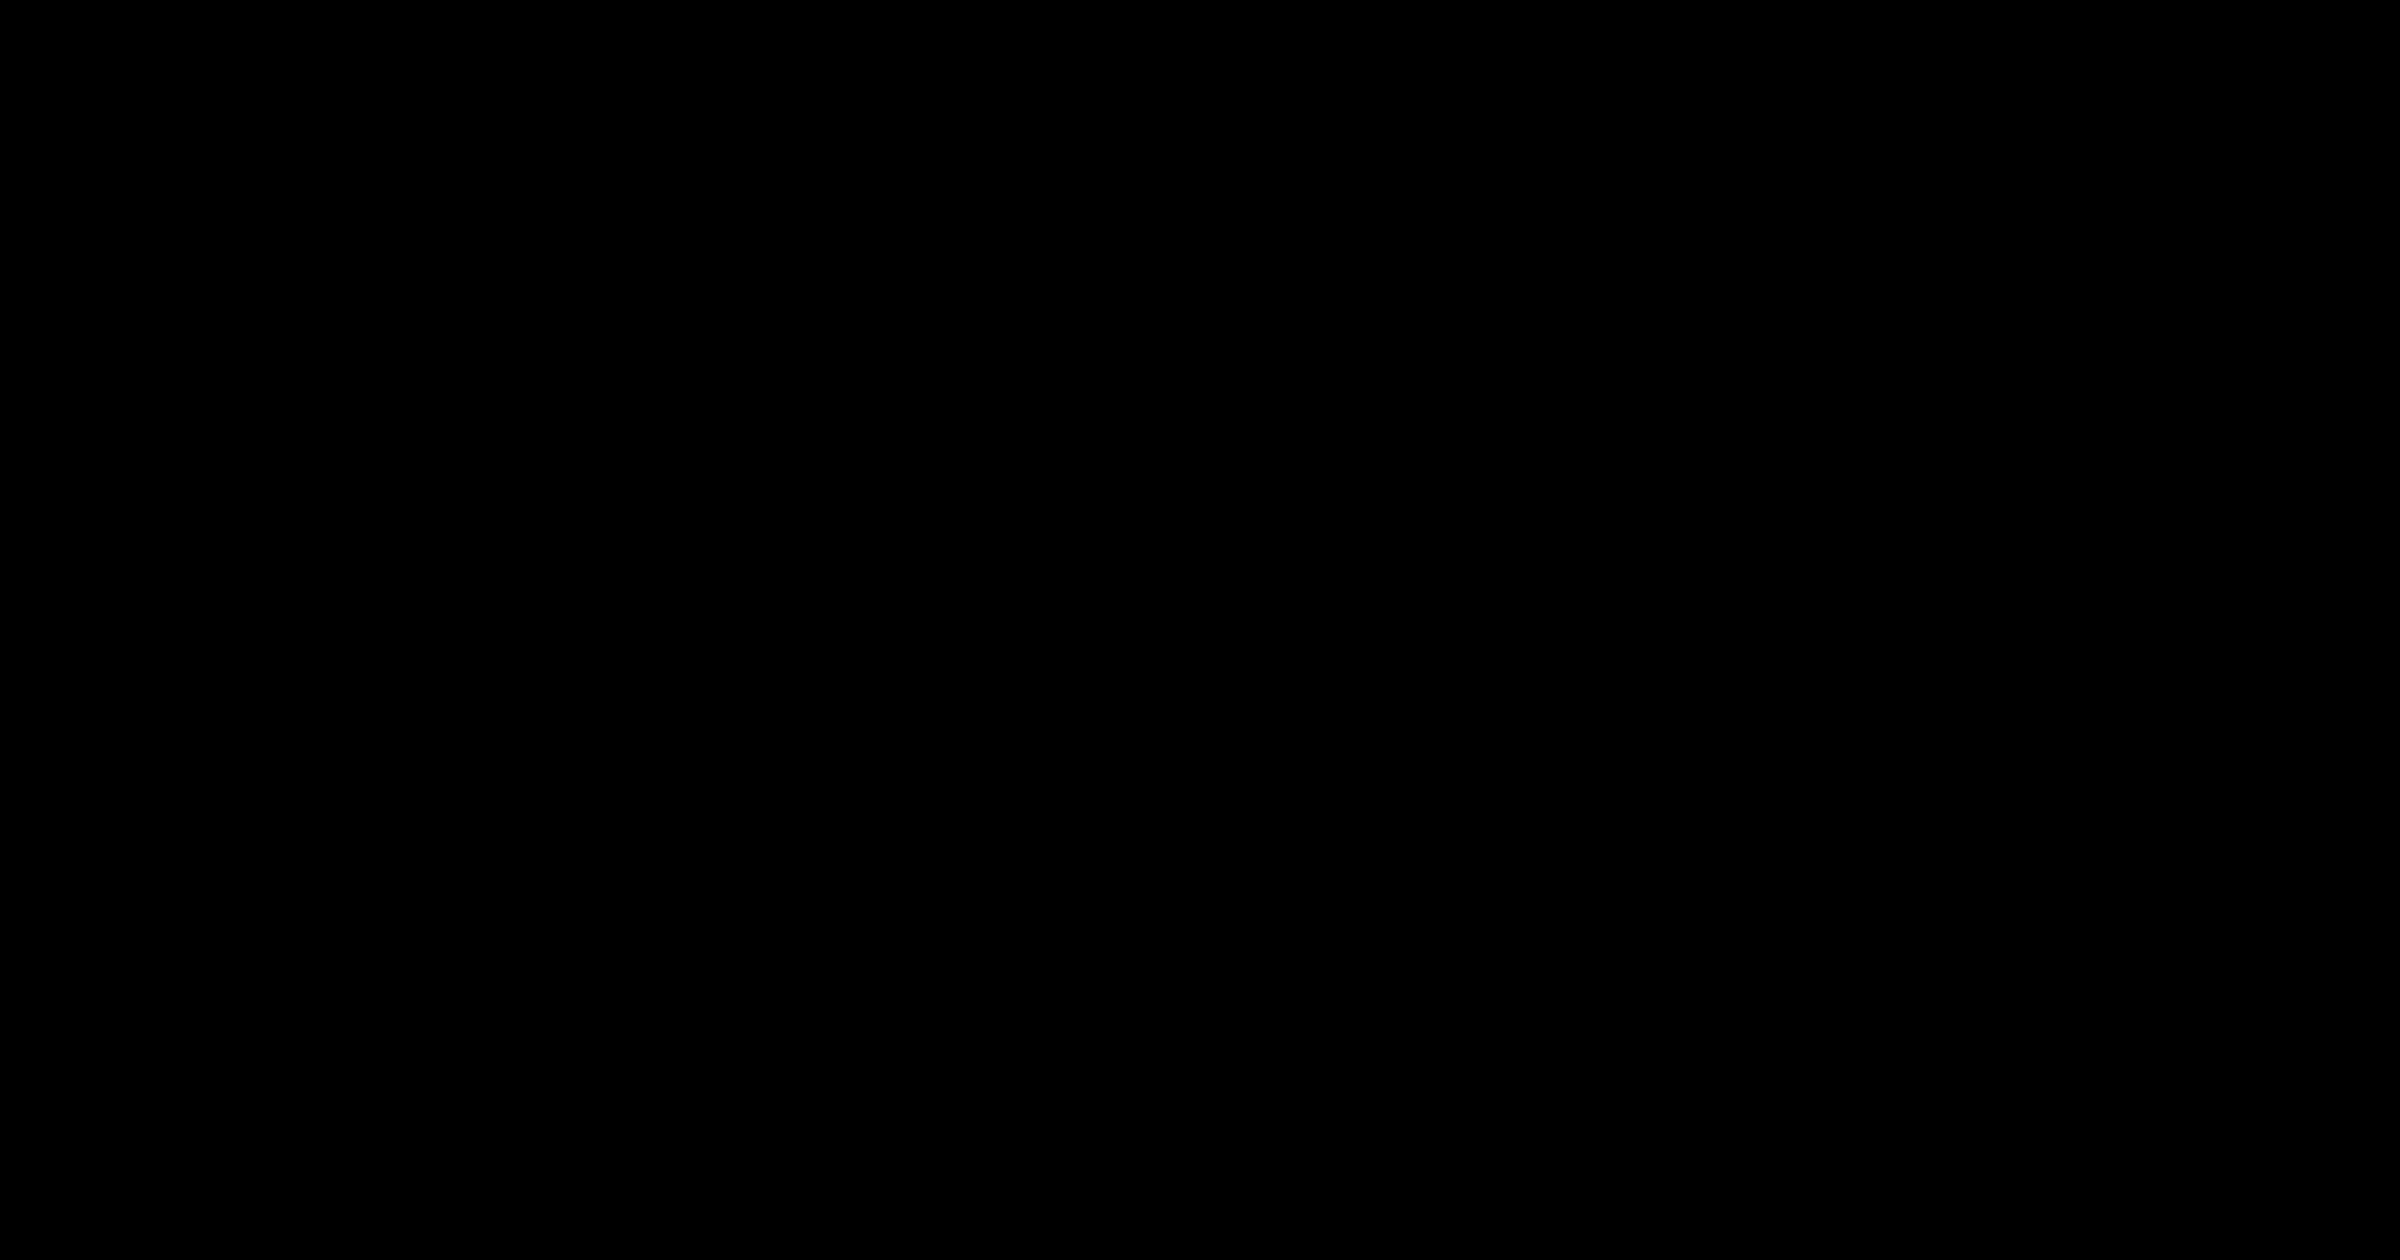 2400x1260 Clipart